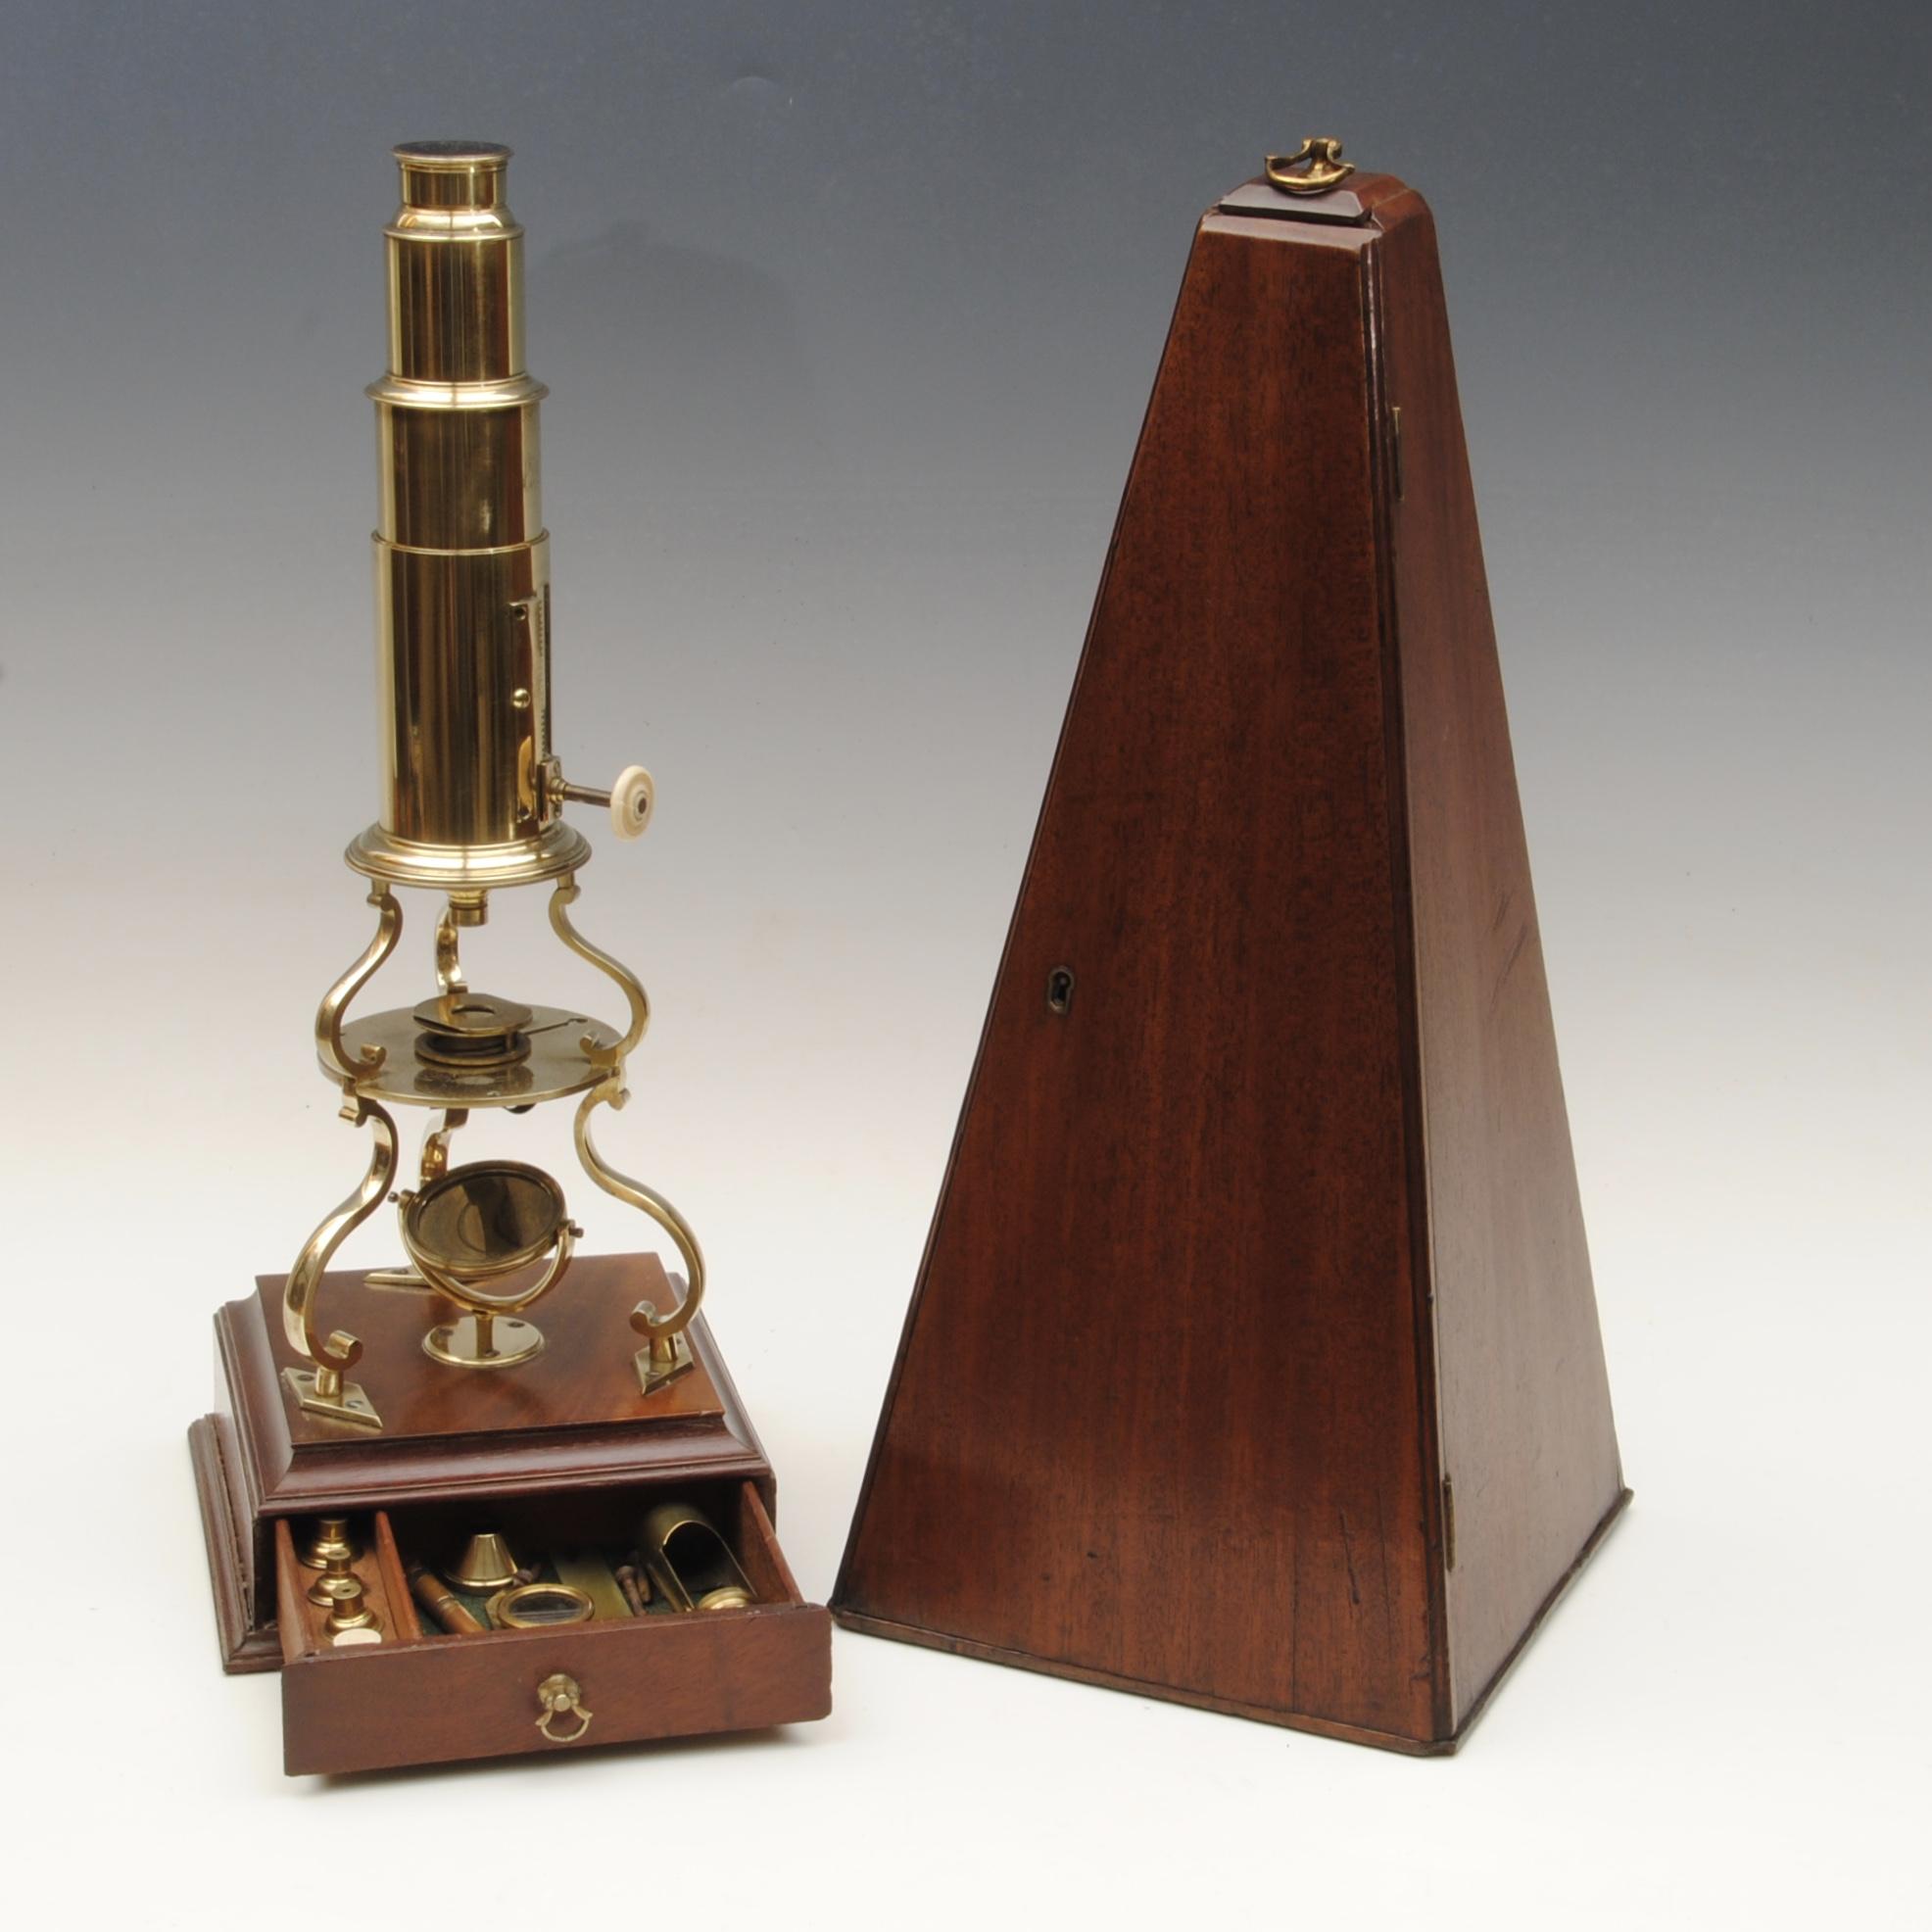 Culpepper type microscope by Abrahams of Bath